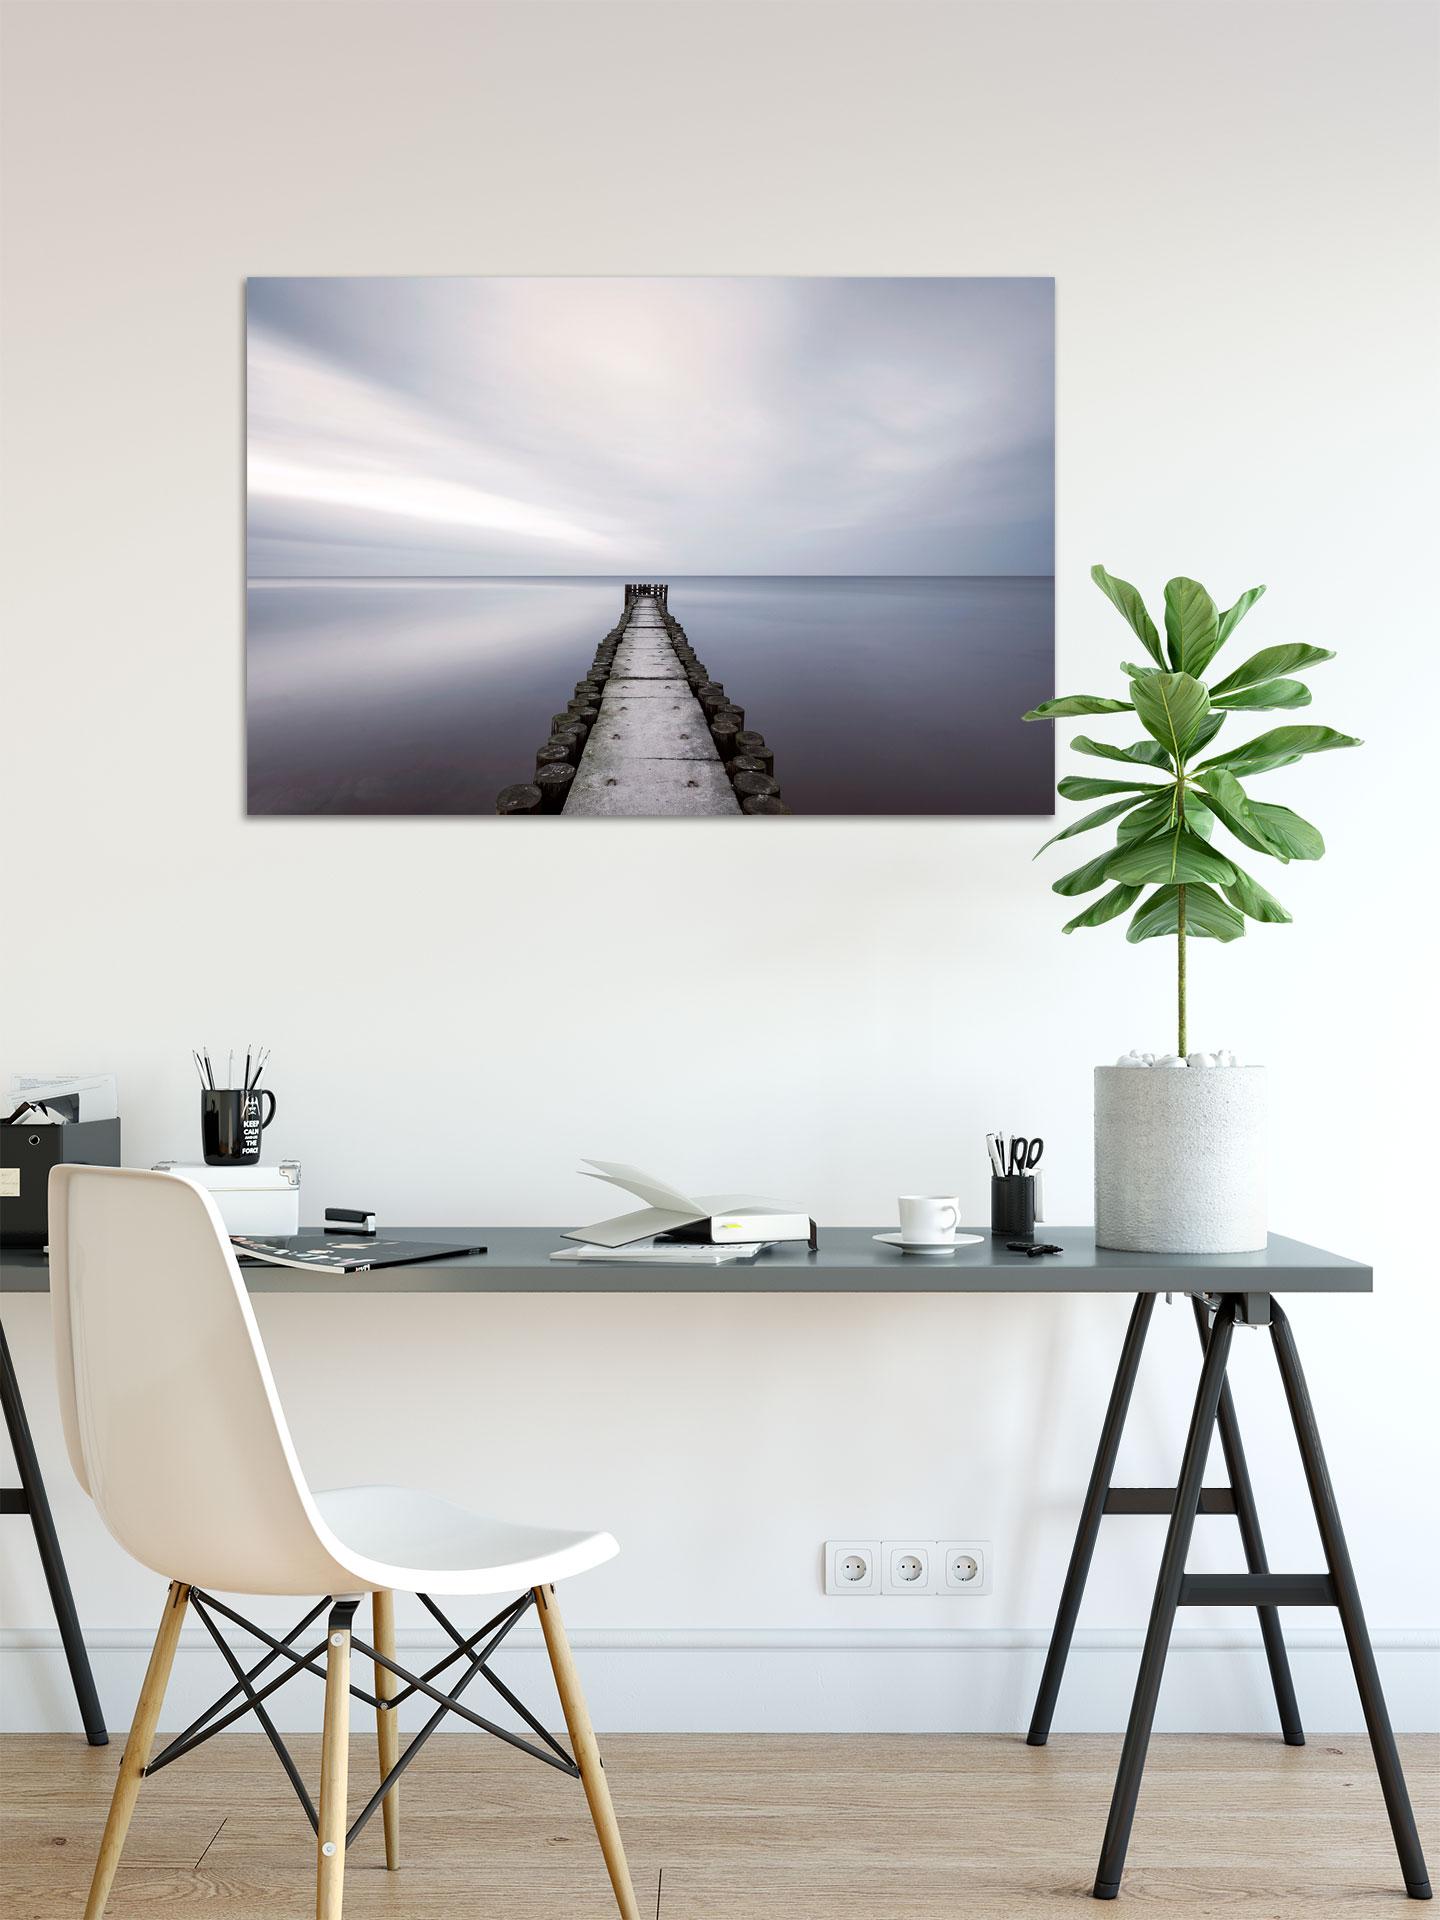 LCW494-stille-ostsee-wandbild-bild-auf-leinwand-acrylglas-aludibond-arbeitszimmer